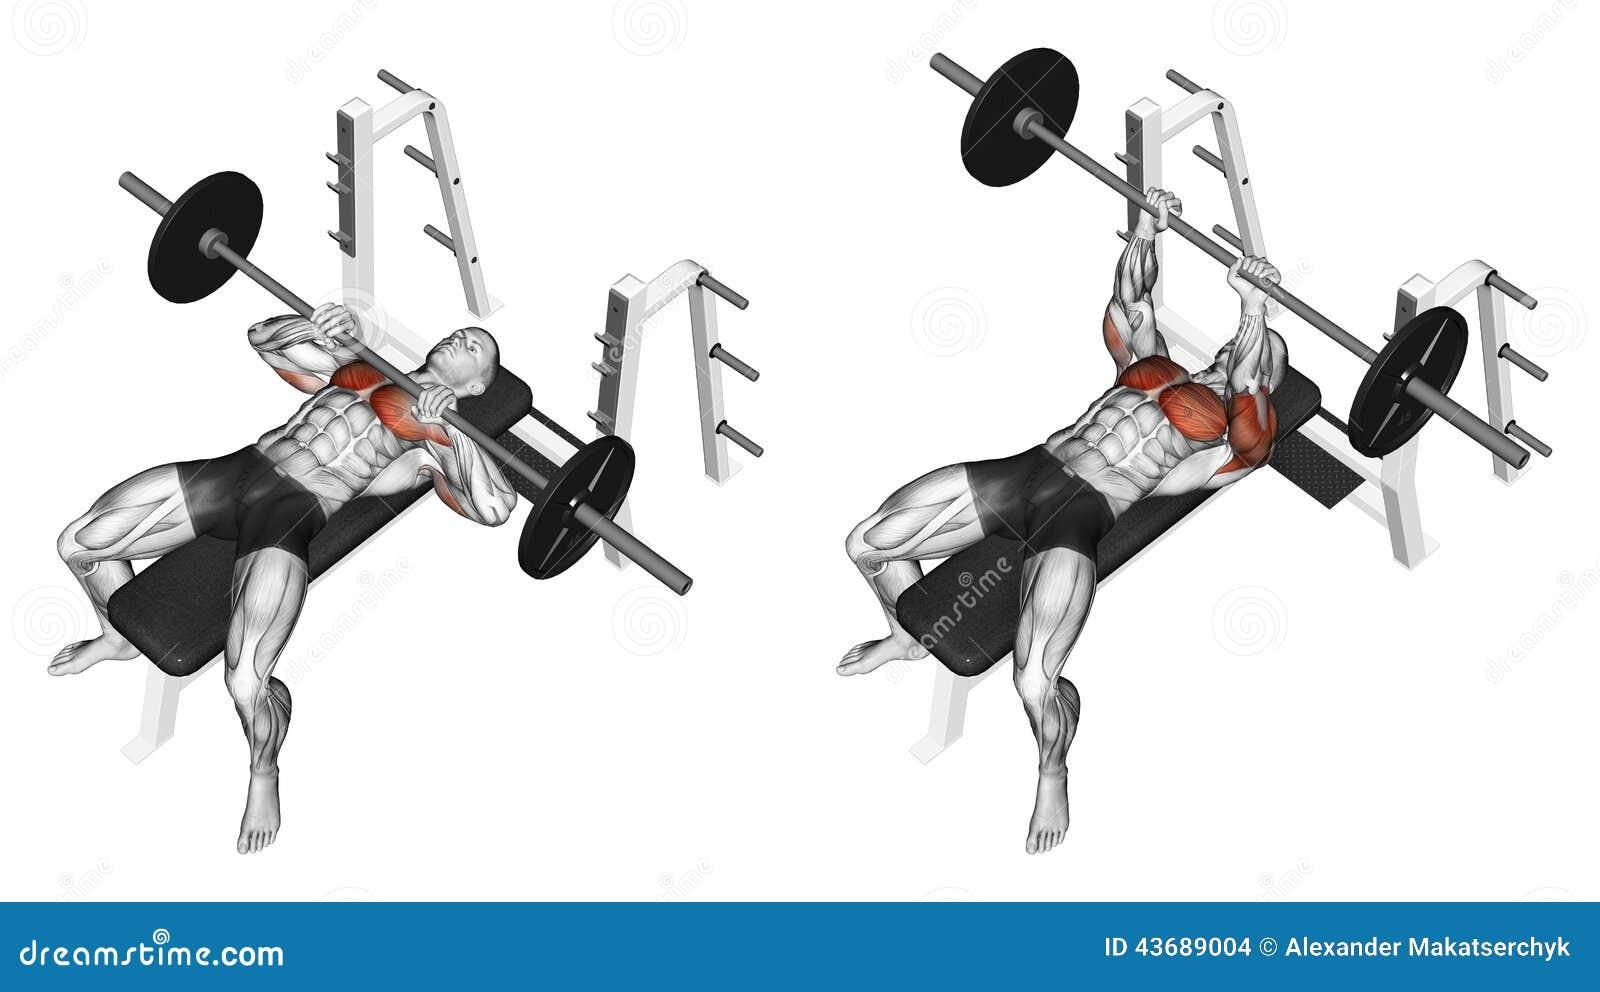 Exercising. Rod narrow grip bench press, lying on